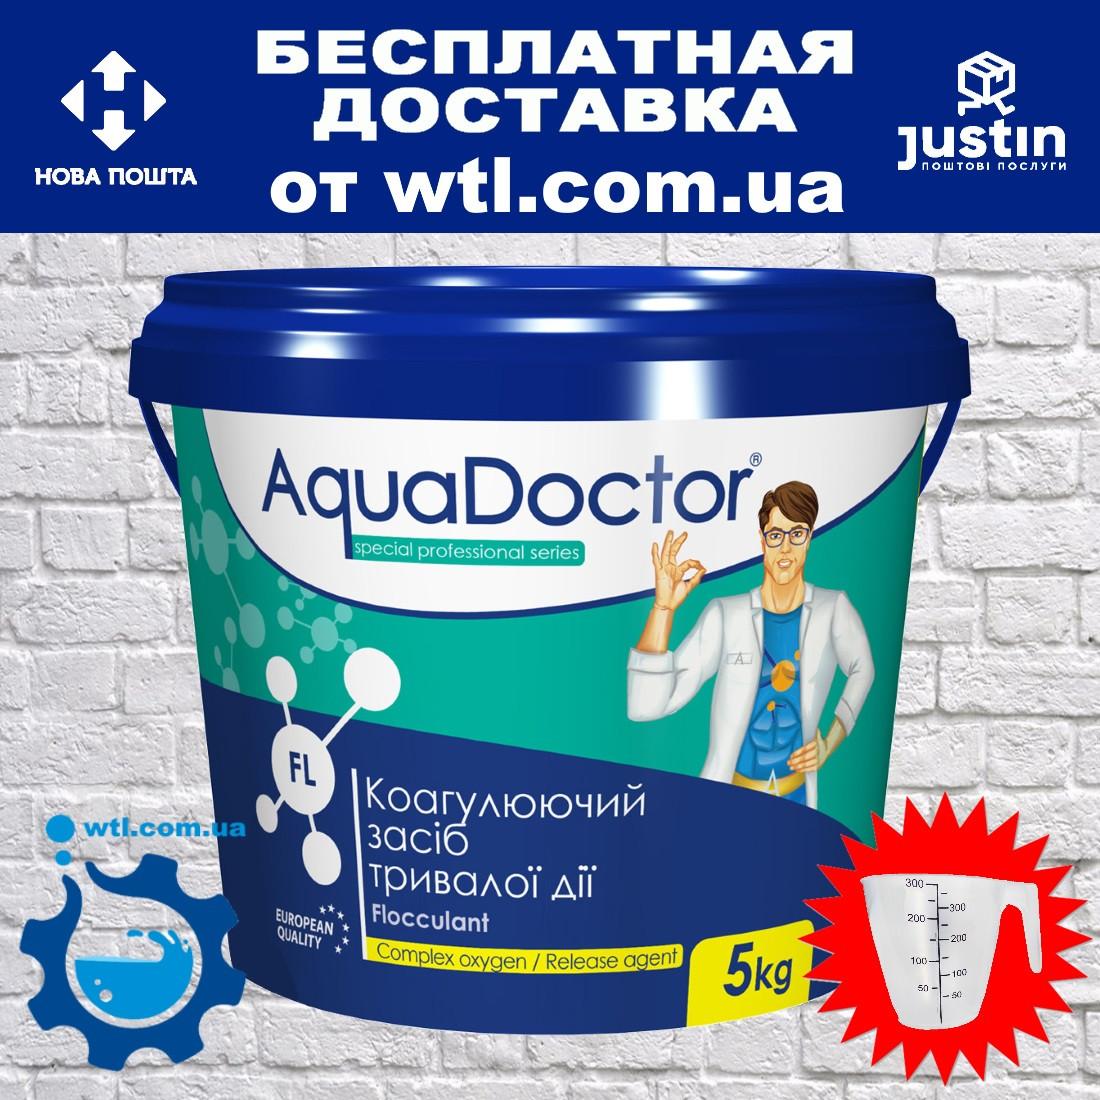 Коагулянт (флокулянт) проти мутності у воді Aquadoctor FL 5 кг в порошку Аквадоктор